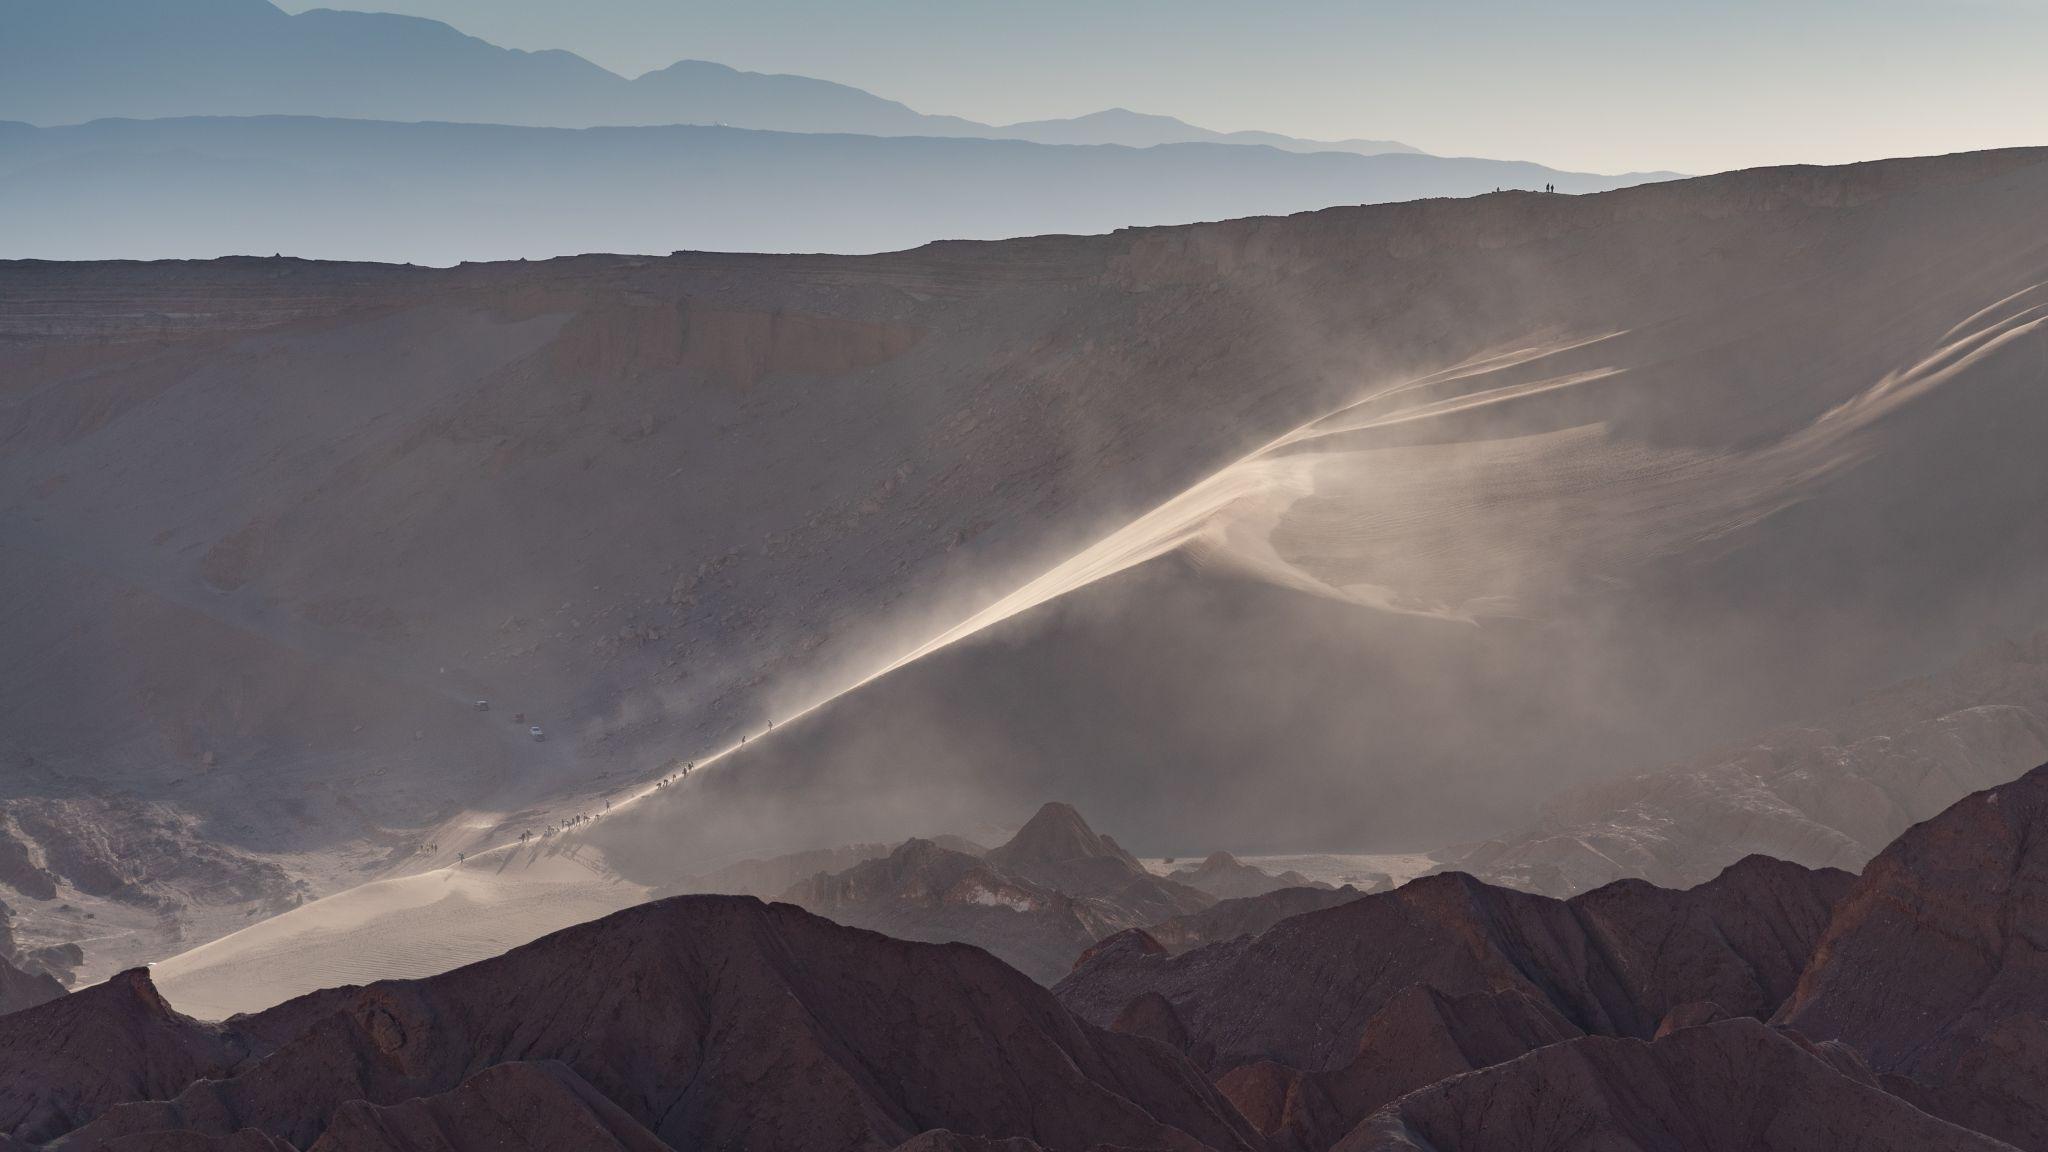 Sand dunes in the area of Valle de Muerte, Chile